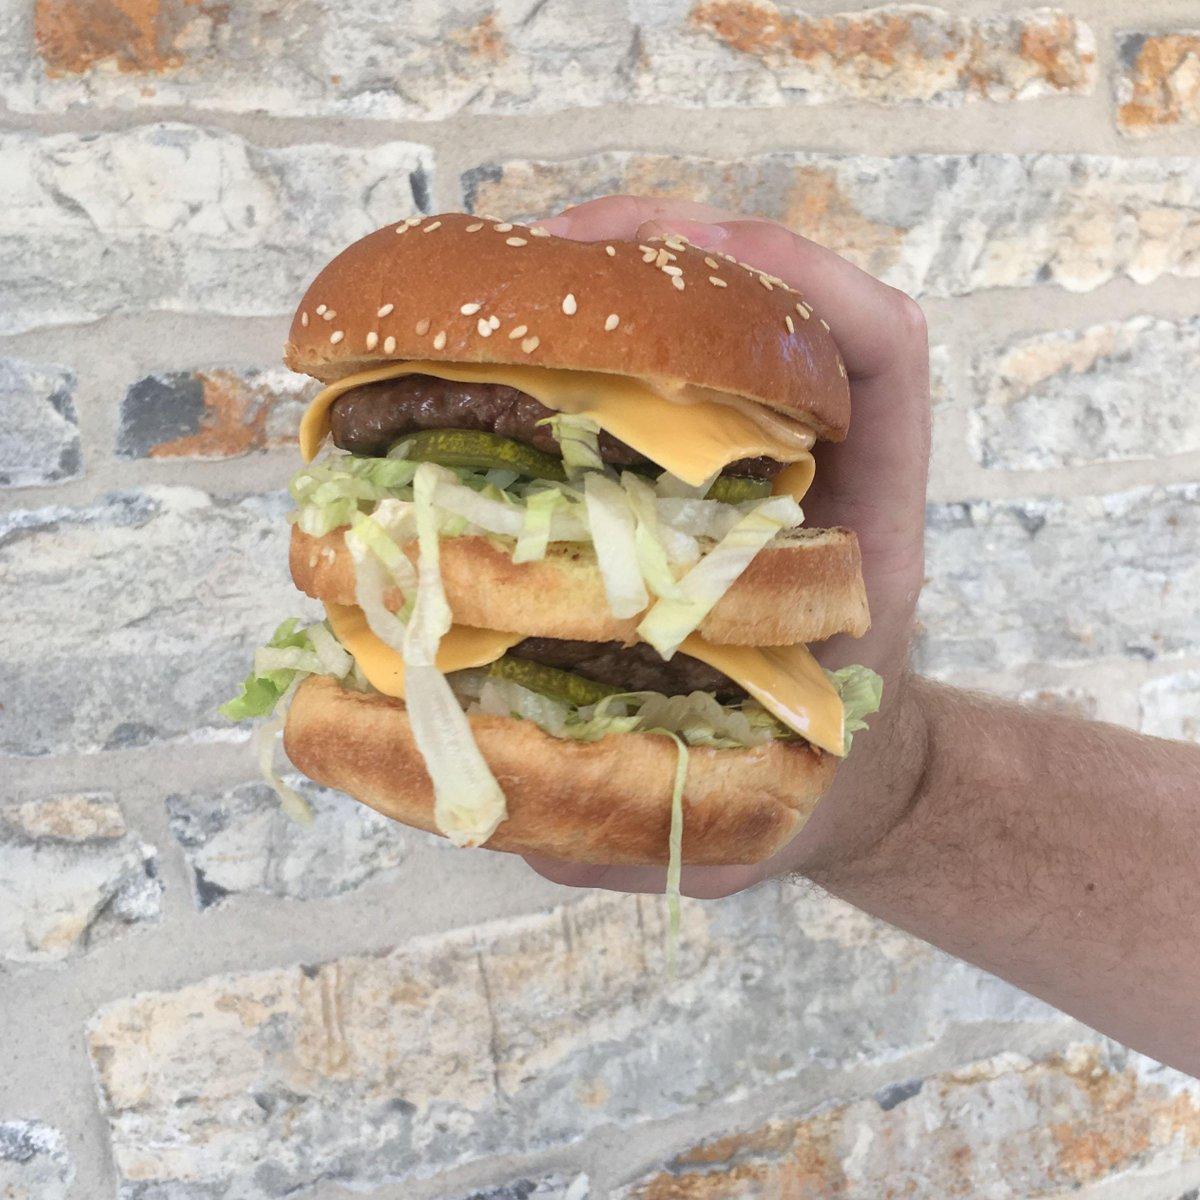 Big Mac #food #foodporn #yummy #pizza https://t.co/WJuOXbkNZO